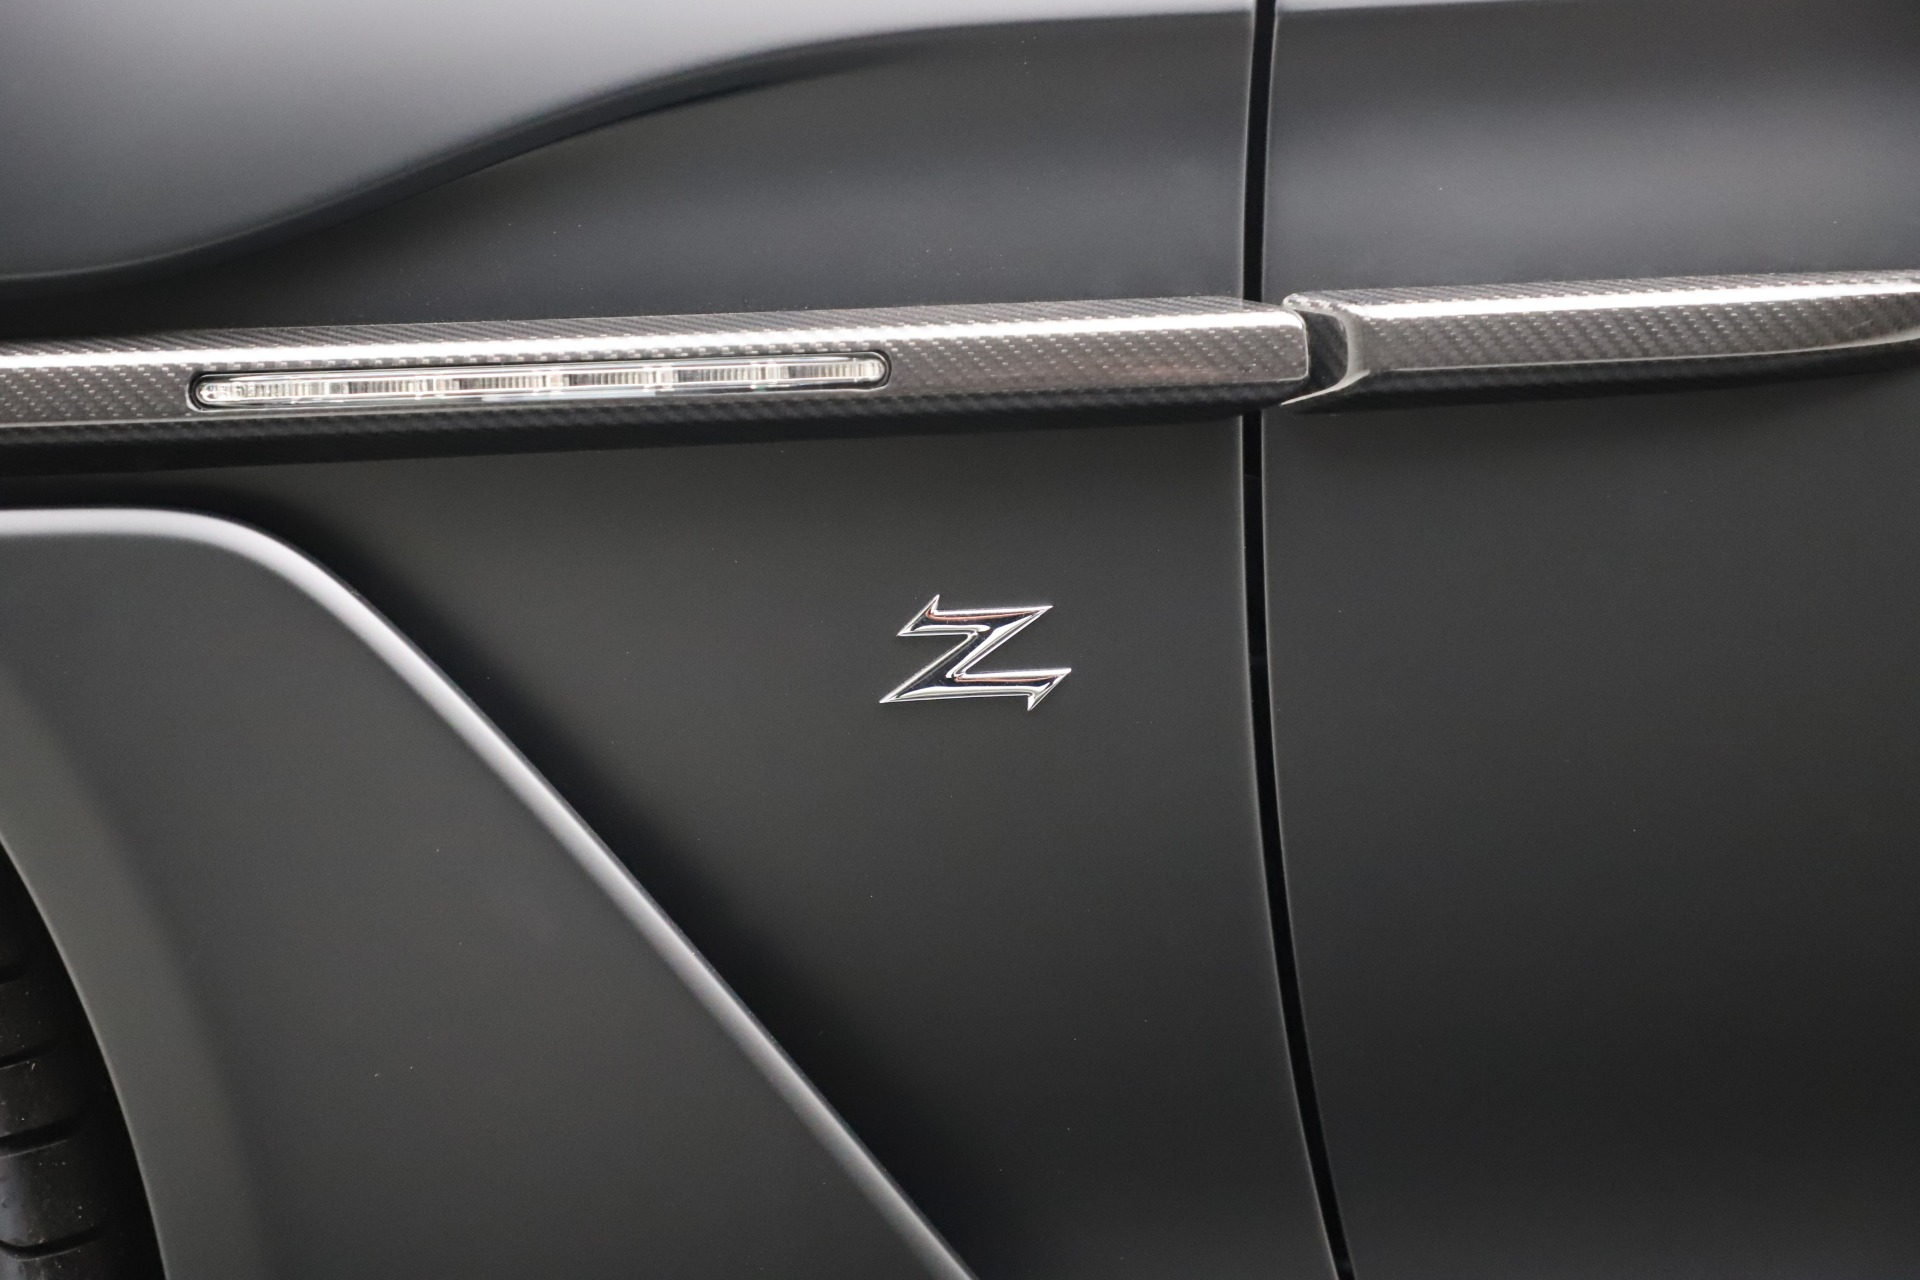 New 2019 Aston Martin Vanquish Shooting Brake For Sale In Westport, CT 3512_p34